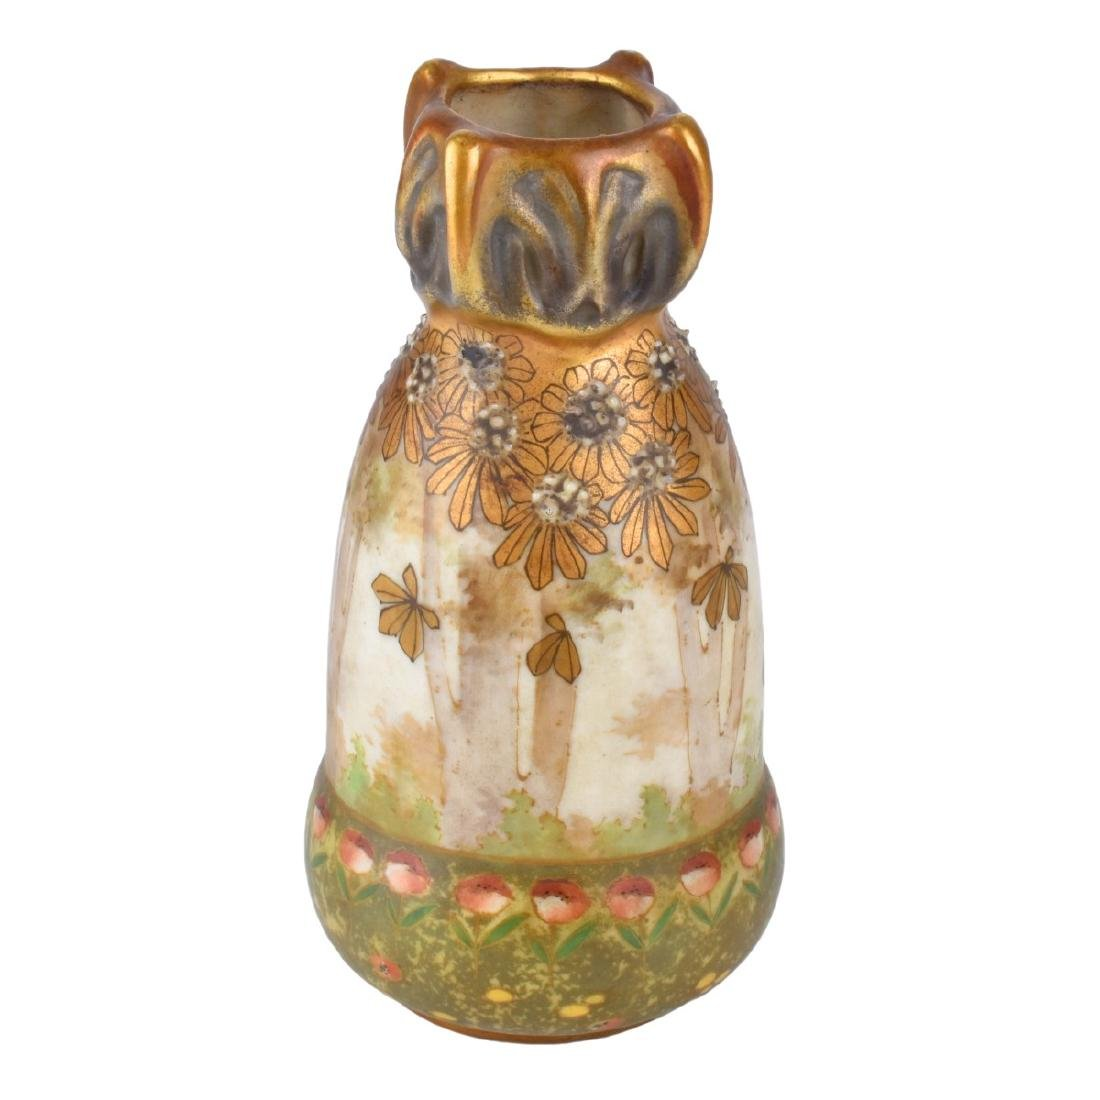 Turn Teplitz Amphora Vase